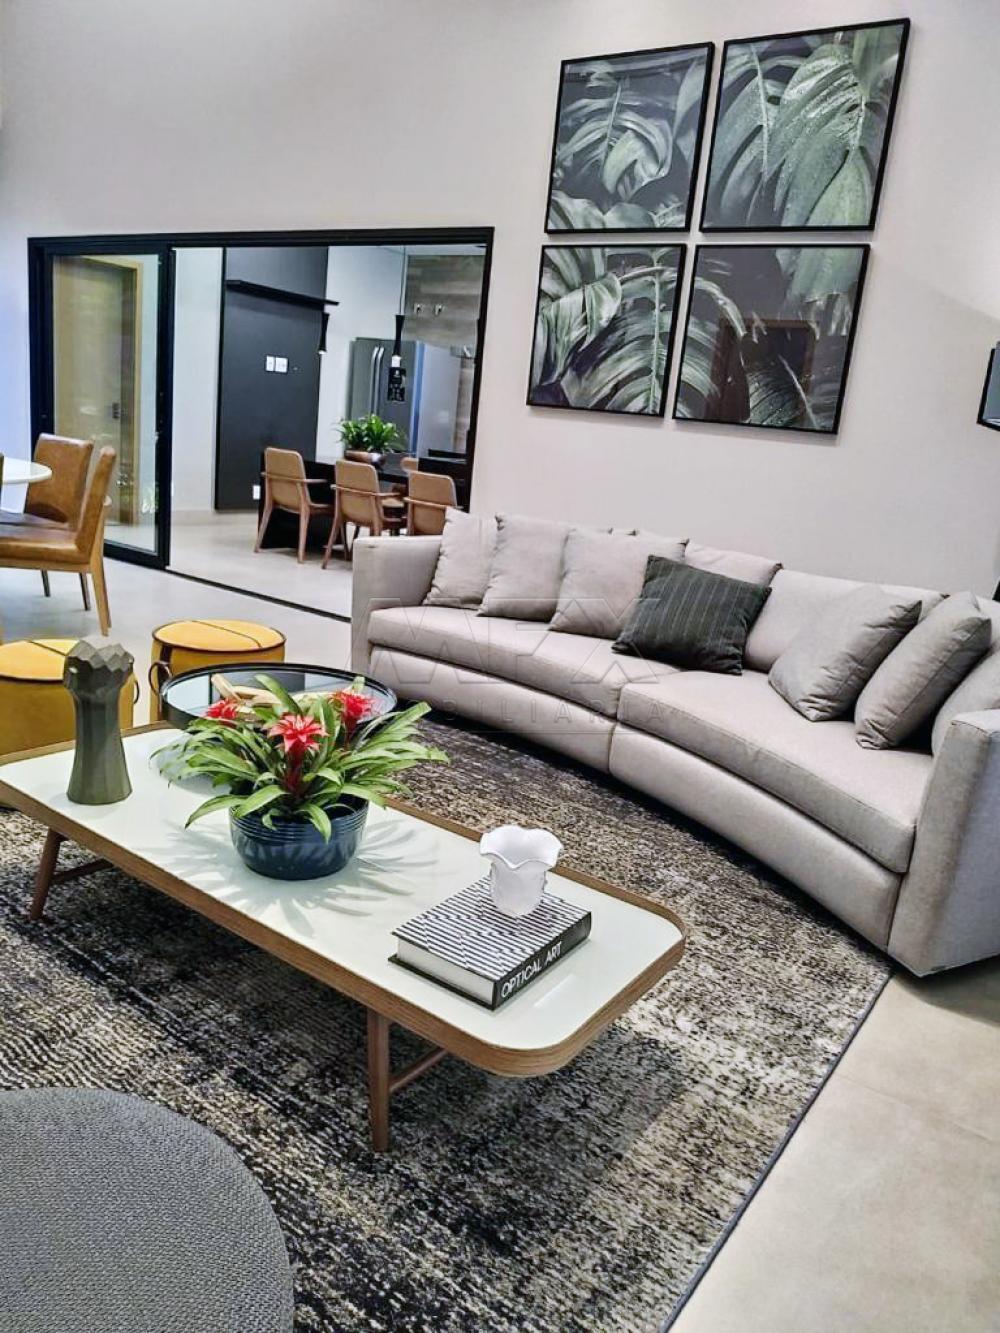 Comprar Casa / Condomínio em Bauru R$ 2.400.000,00 - Foto 7